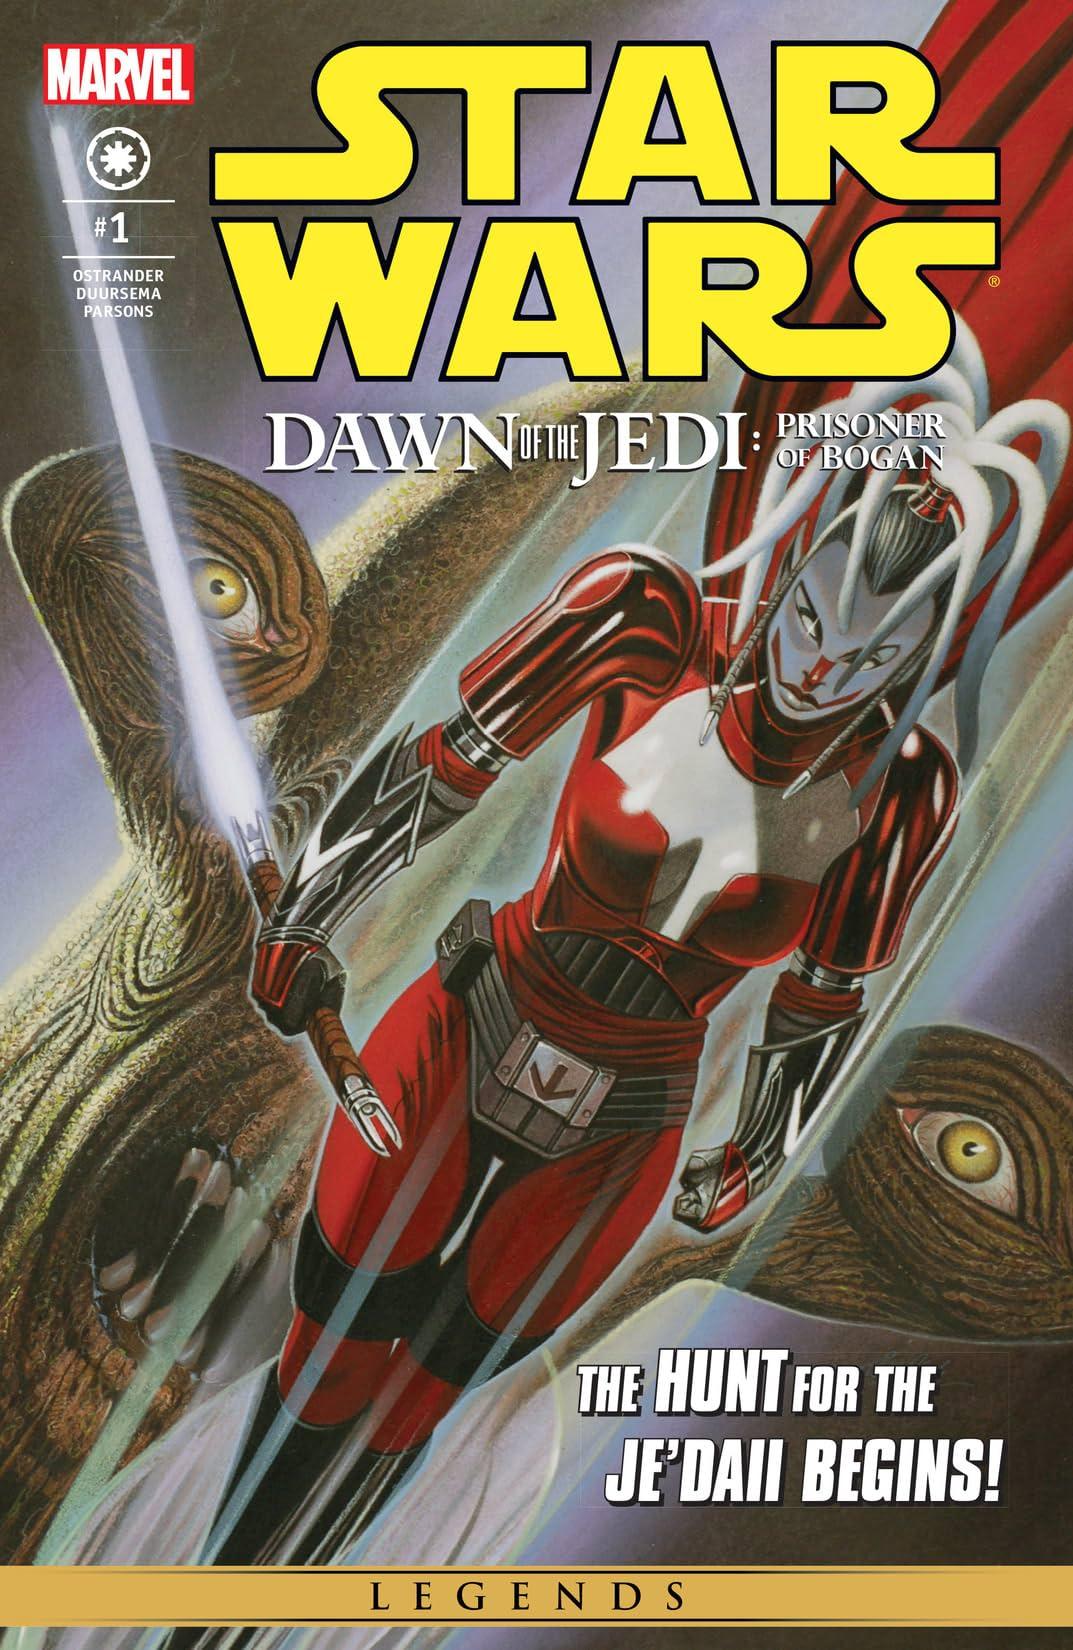 Star Wars: Dawn Of The Jedi - The Prisoner Of Bogan (2012-2013) #1 (of 5)